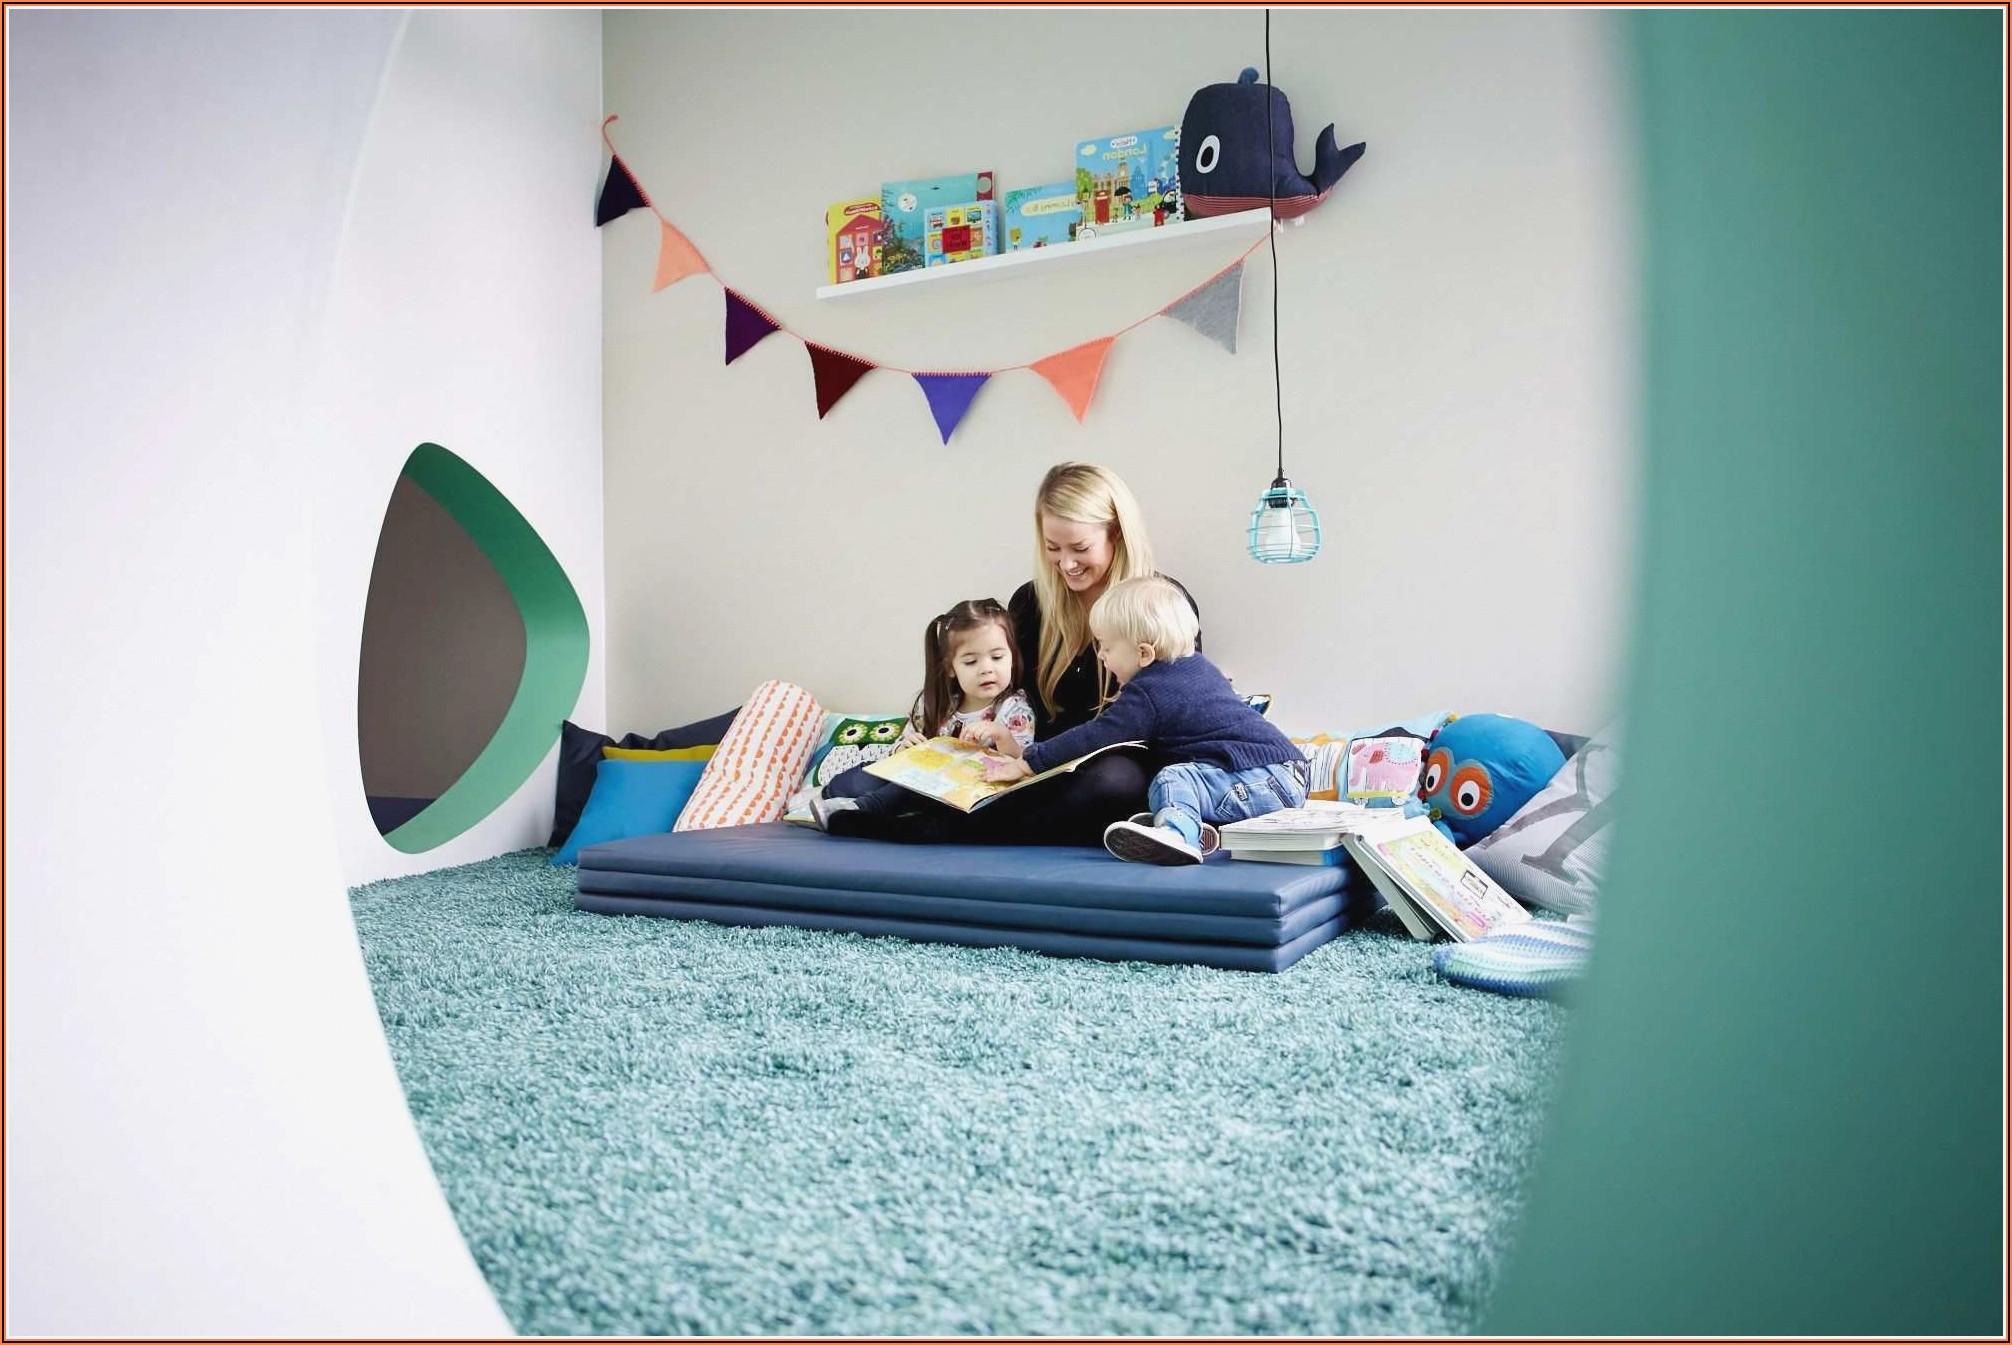 Kita Kinderzimmer Seebek (barmbek) Hamburg